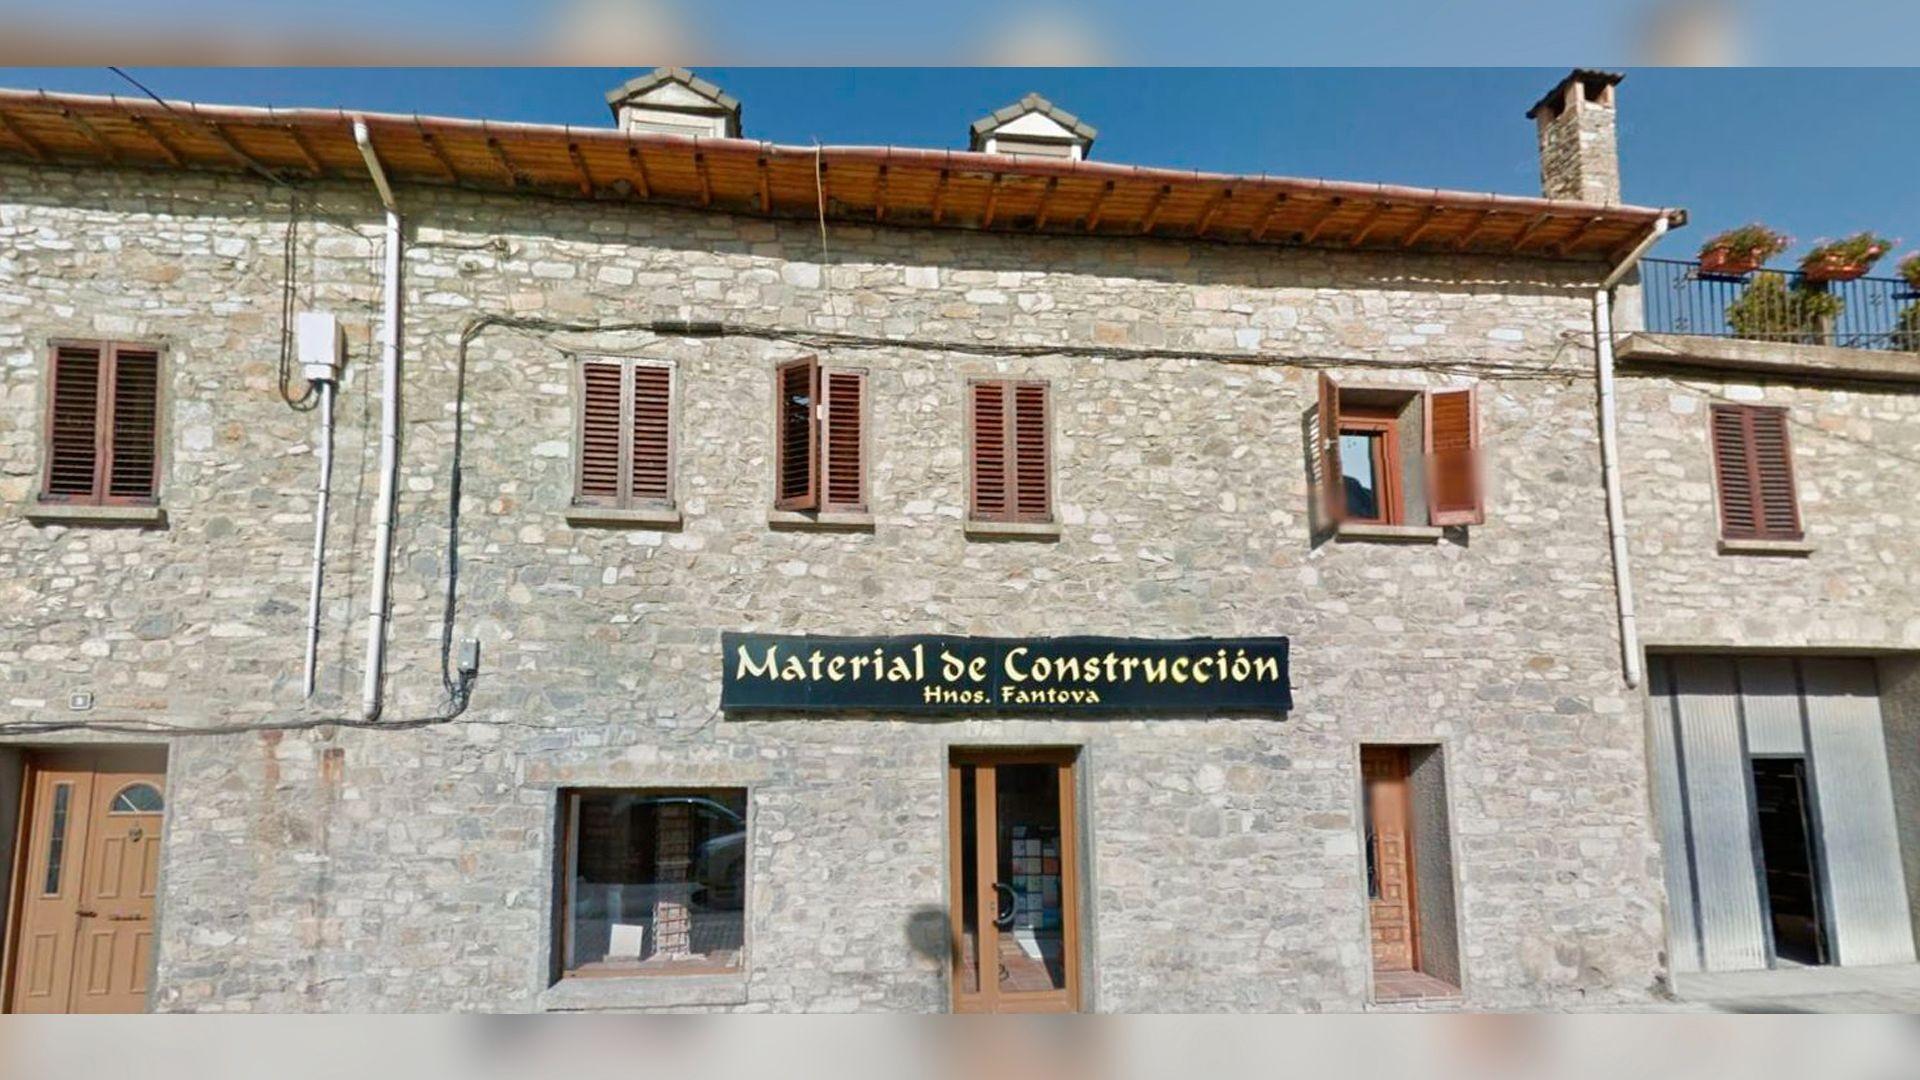 Empresa de materiales de construcción en Aínsa, Huesca